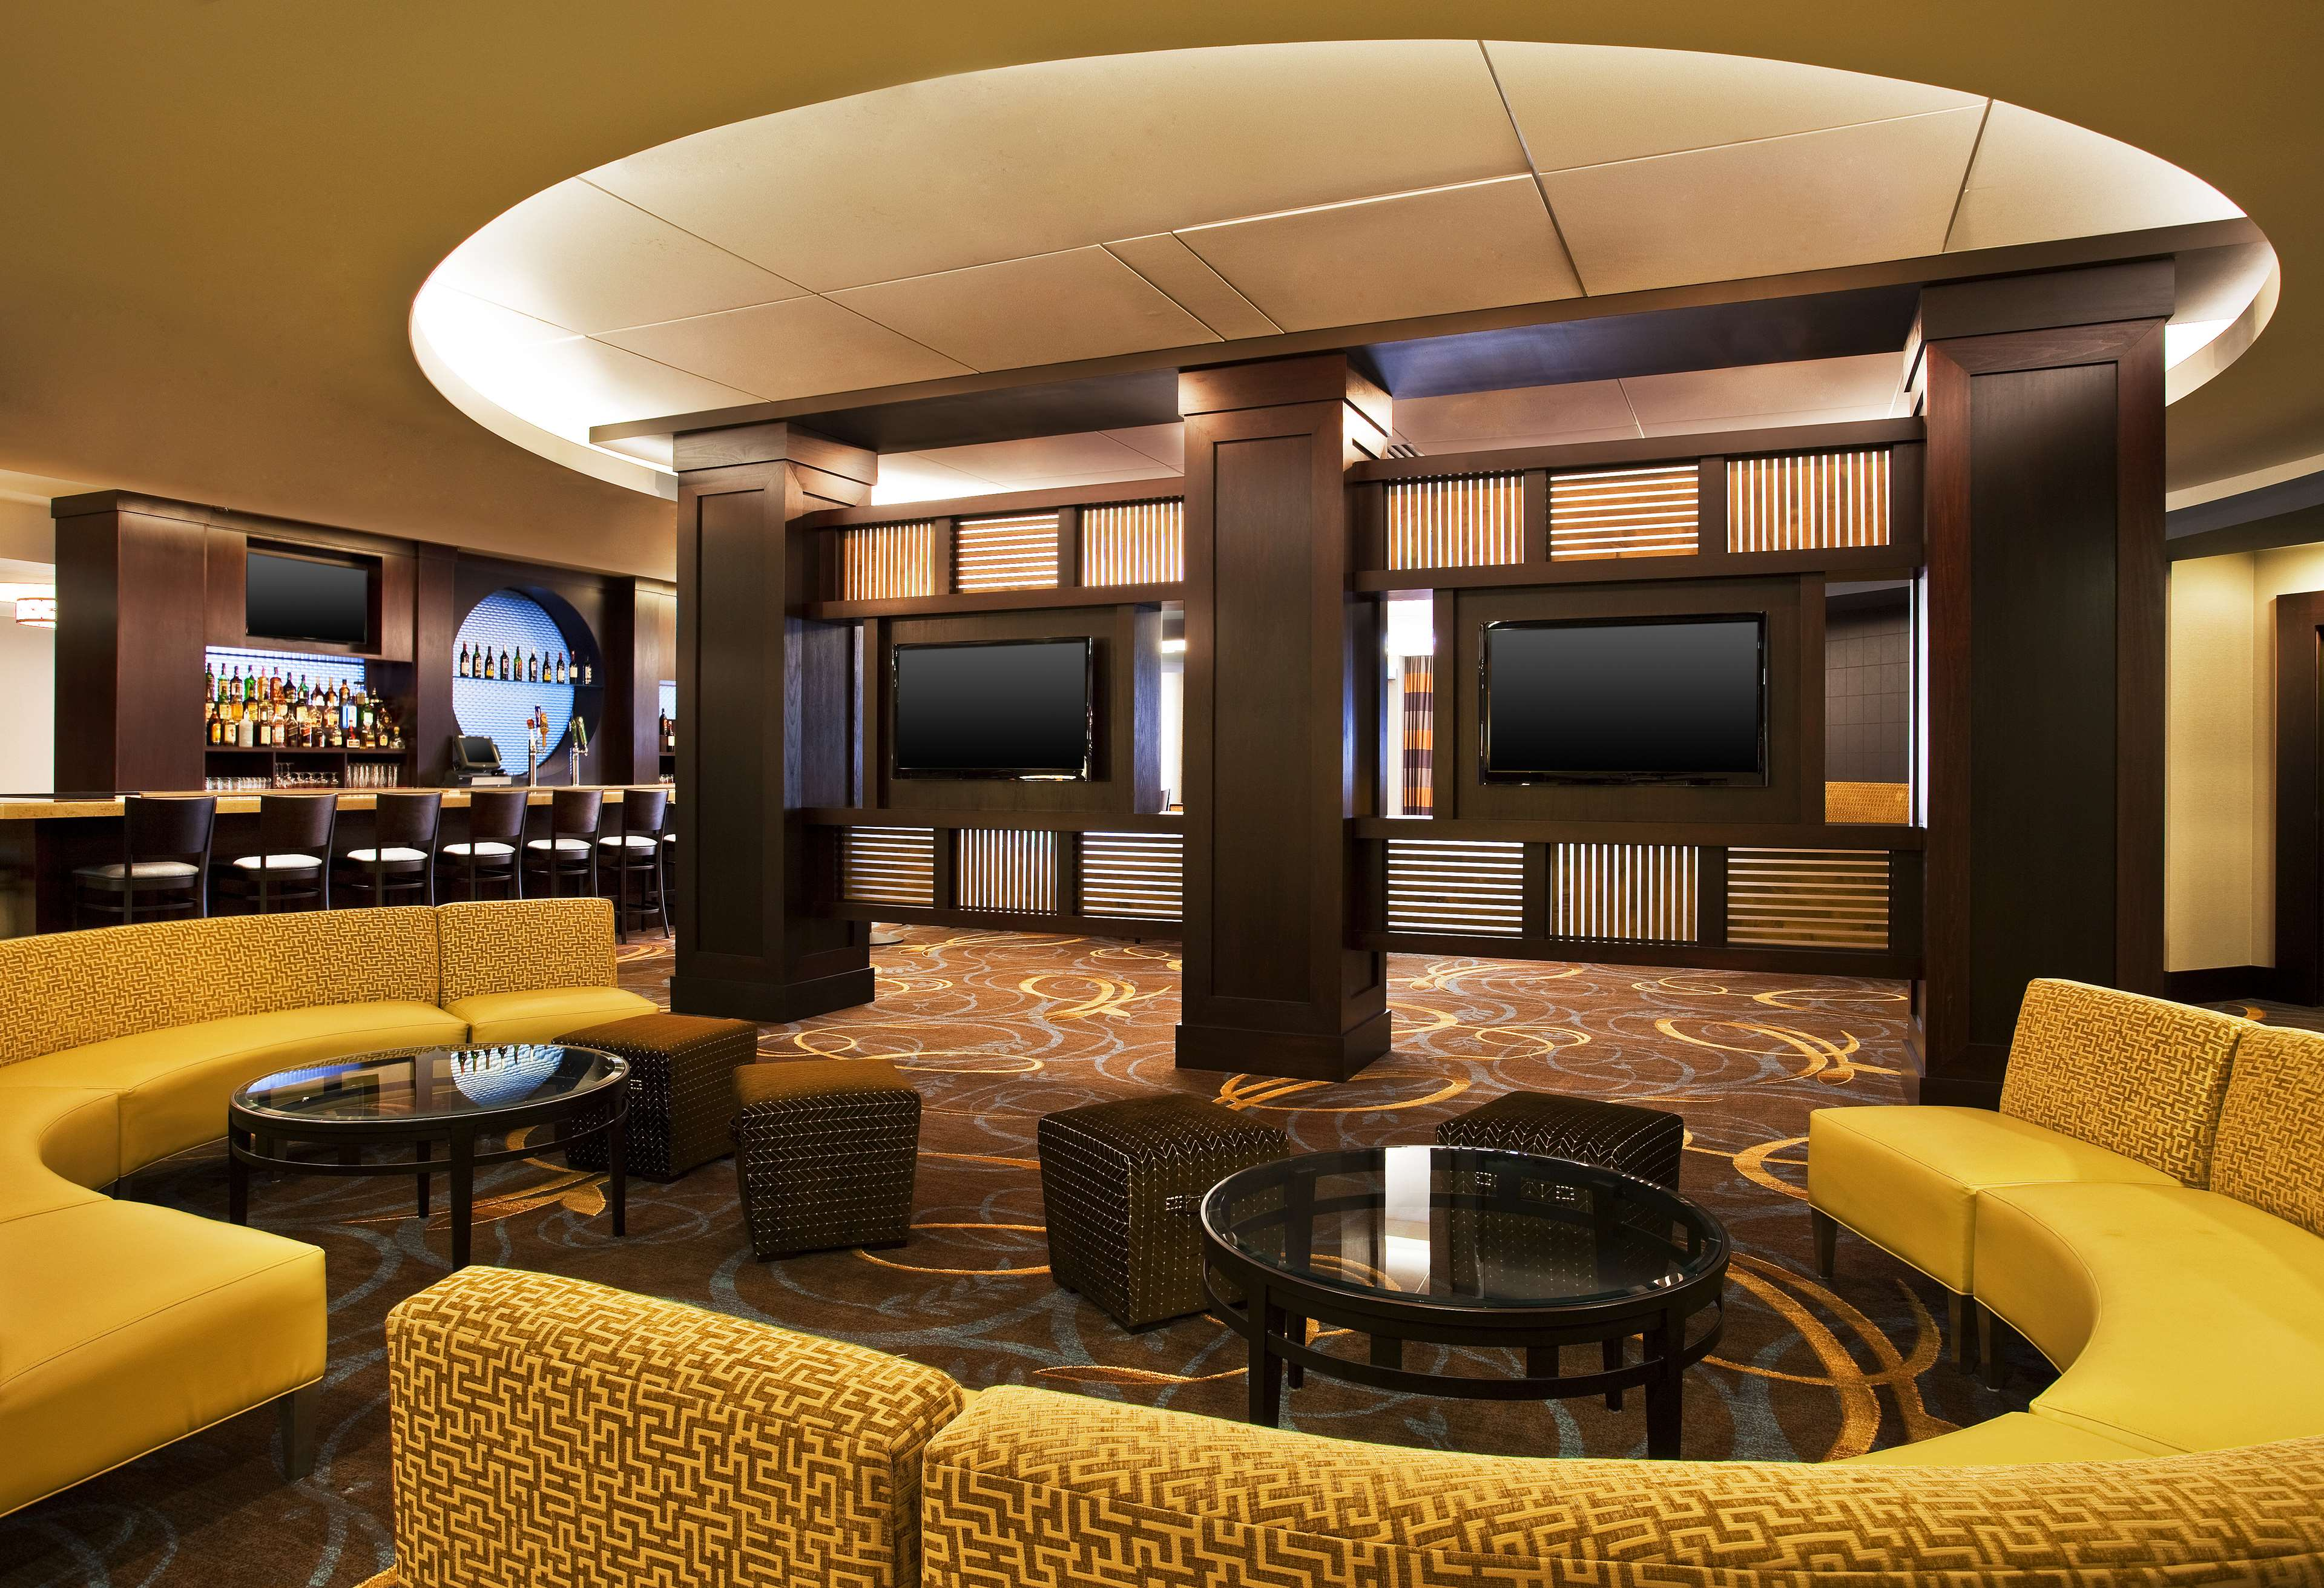 Sheraton Silver Spring Hotel image 3